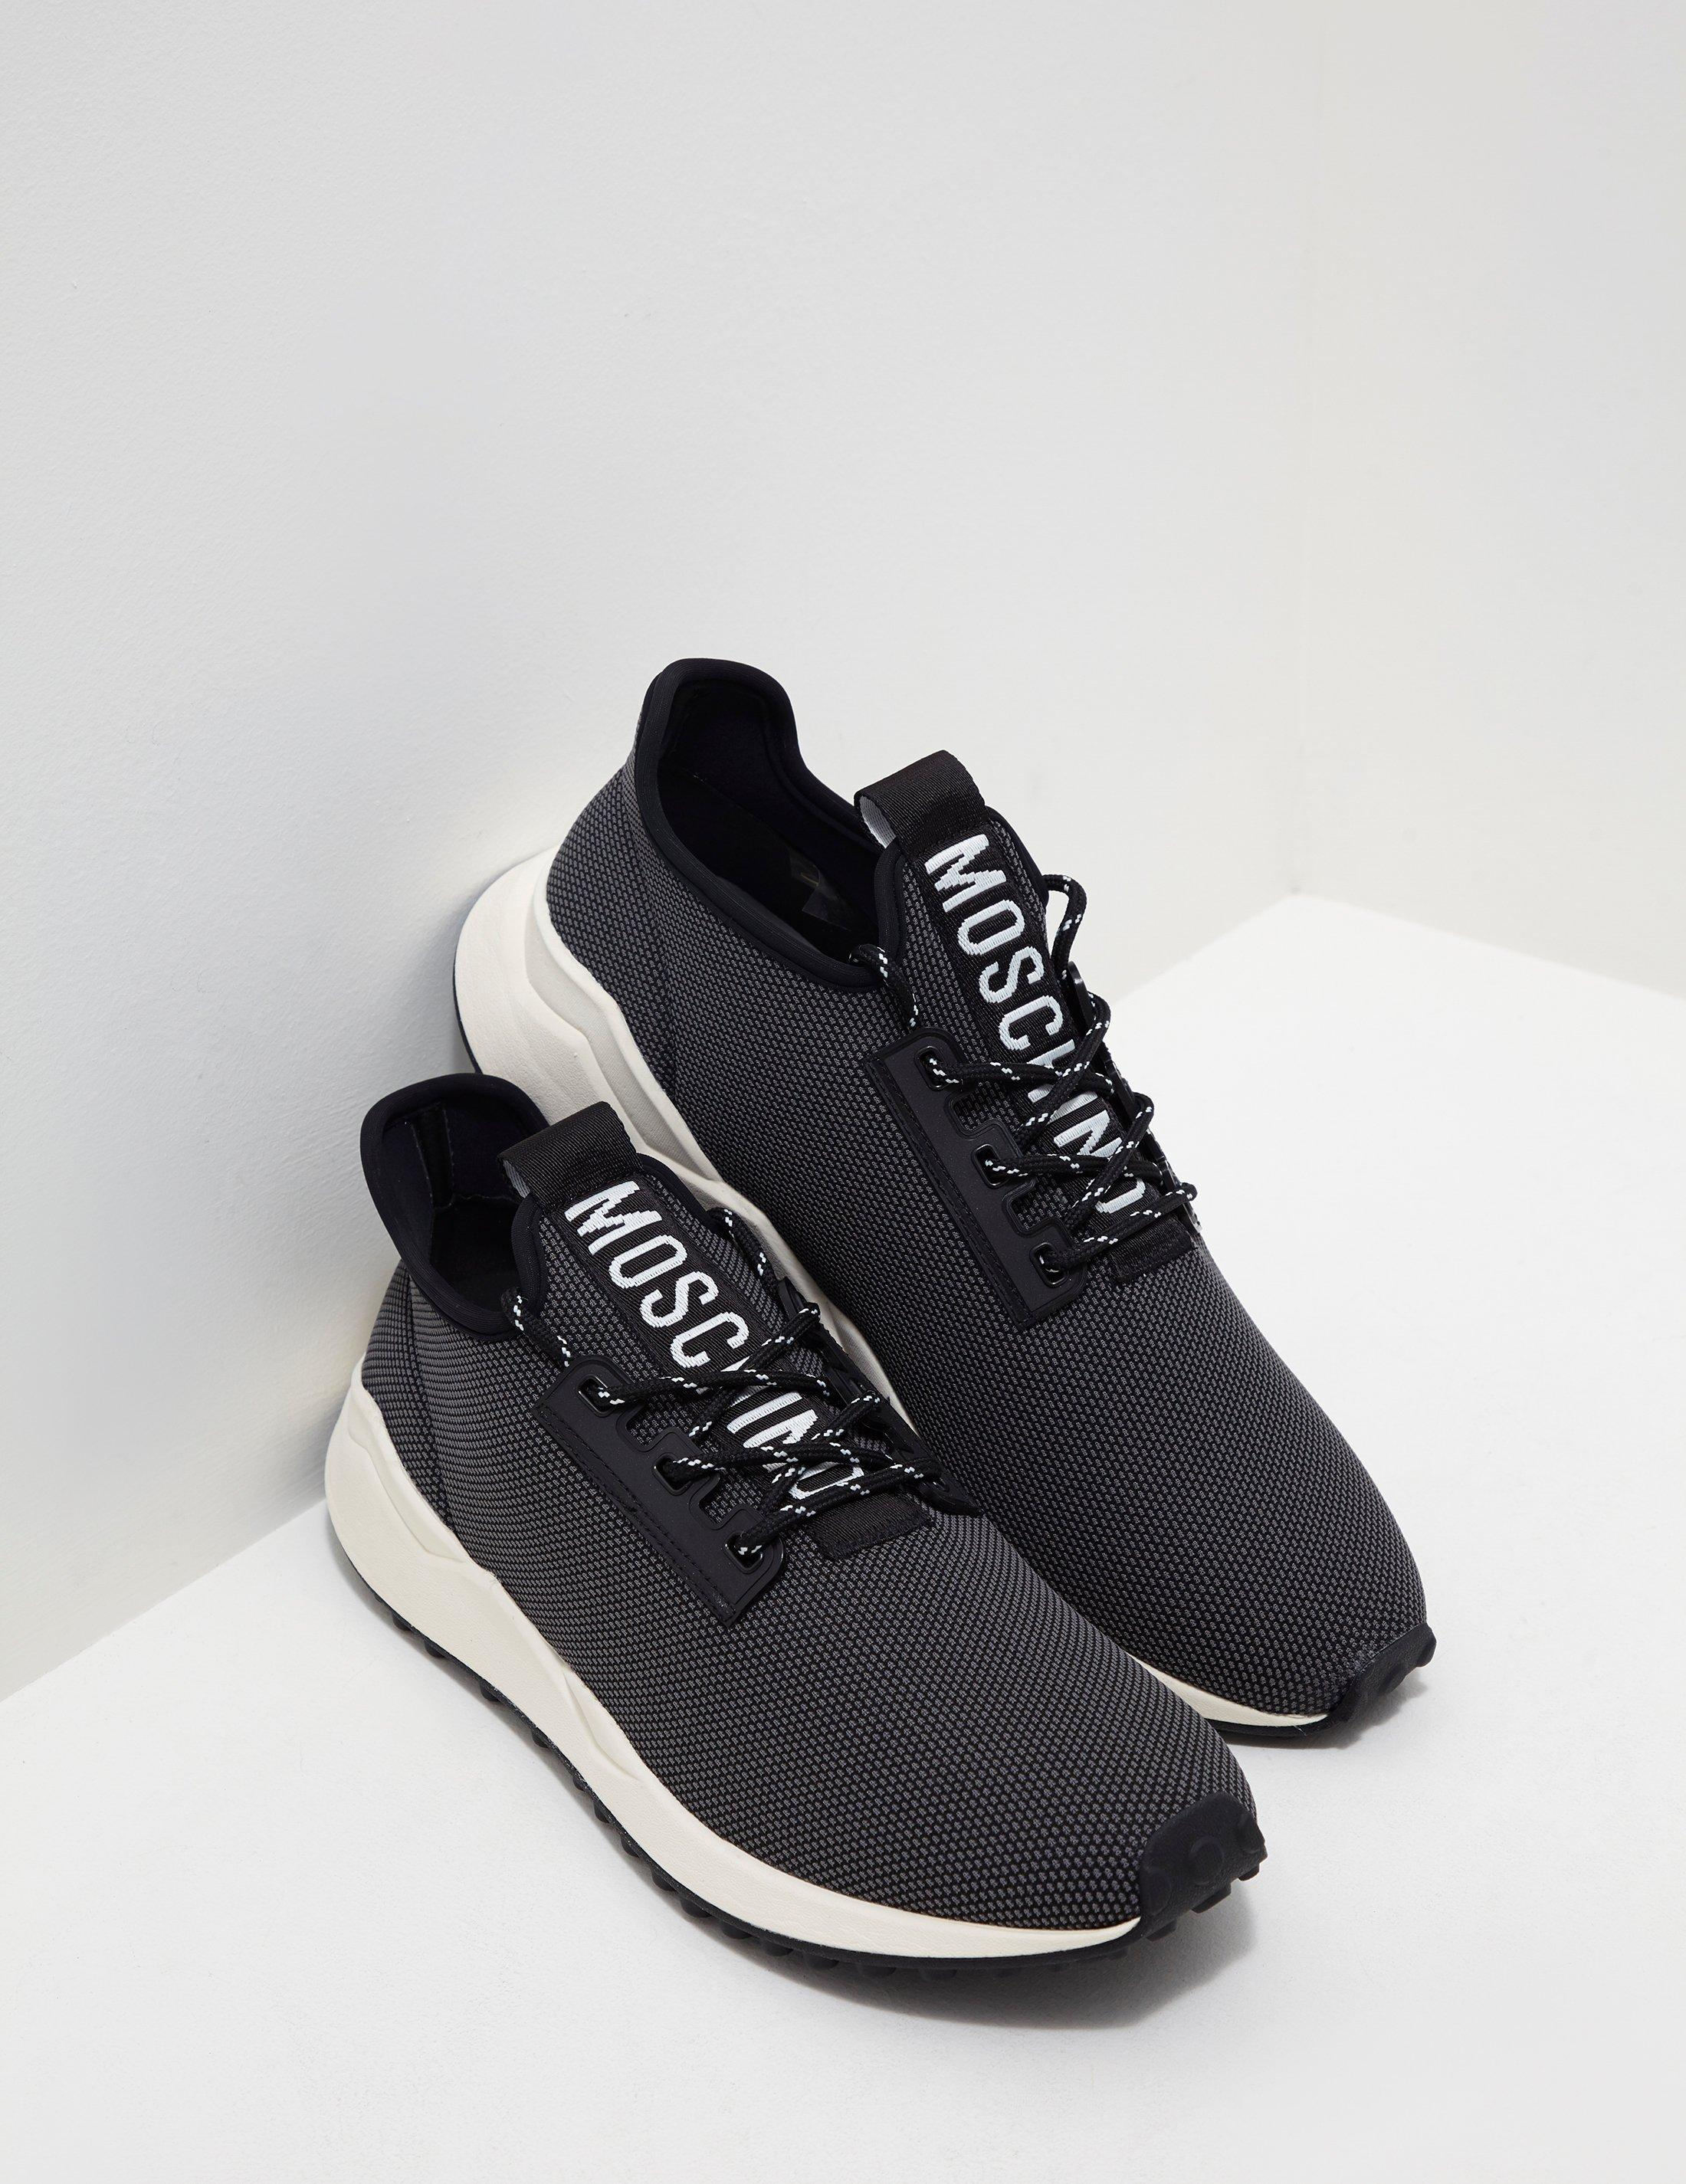 d627b35e5c Lyst - Love Moschino Nylon Sneakers Black in Black for Men - Save 28%